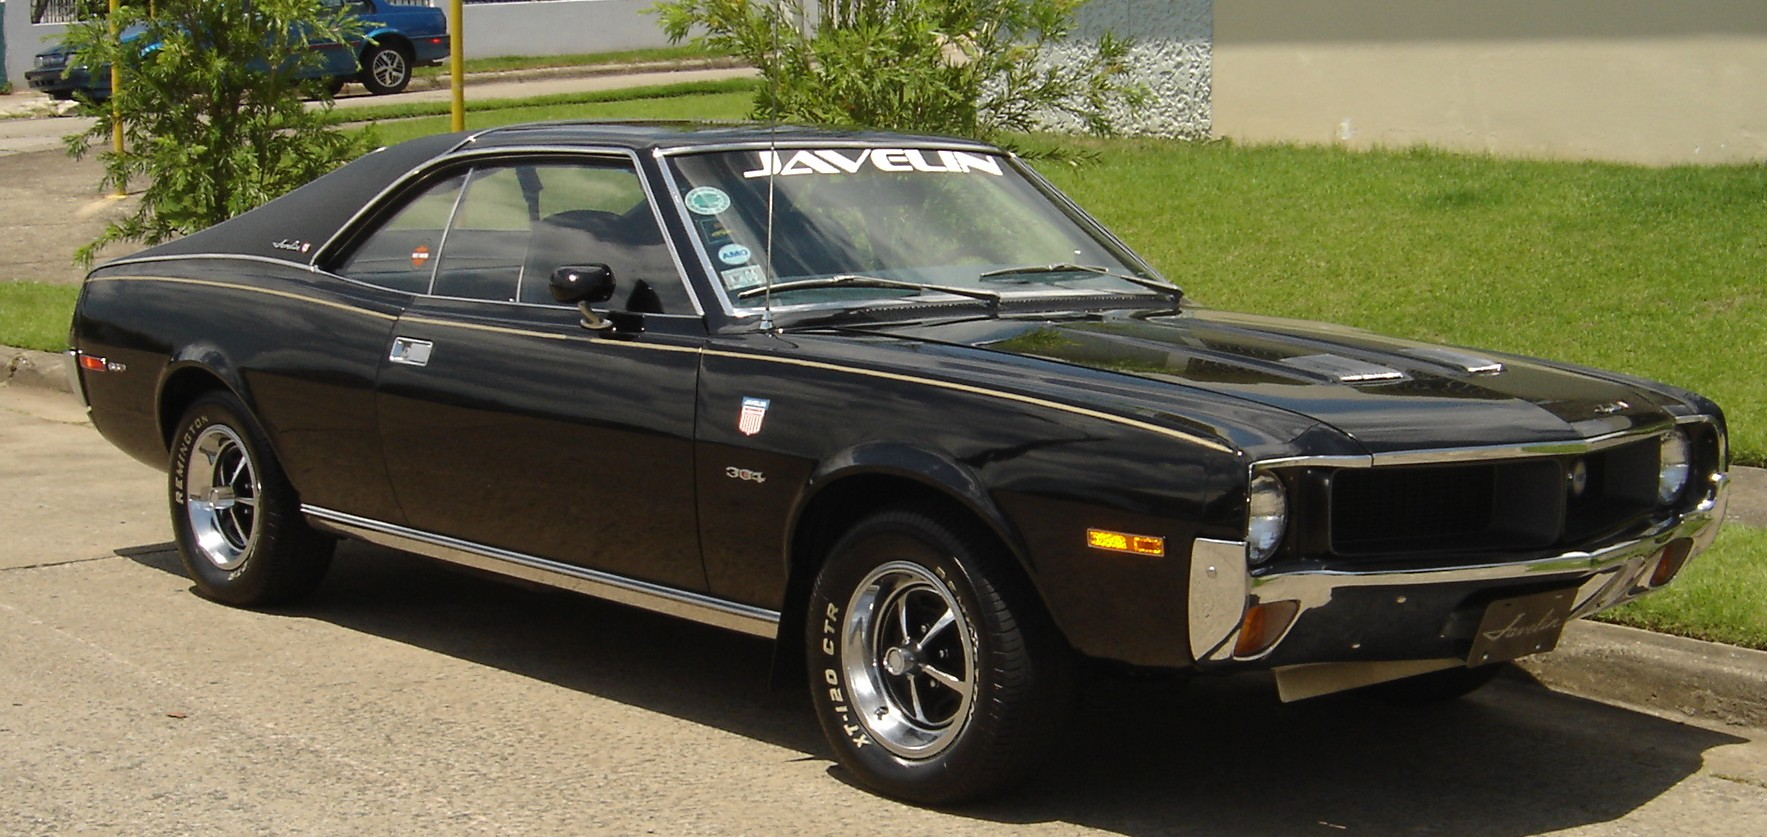 Muscle Car Throwdown 1970 Amc Javelin Vs Ford Mustang Black The